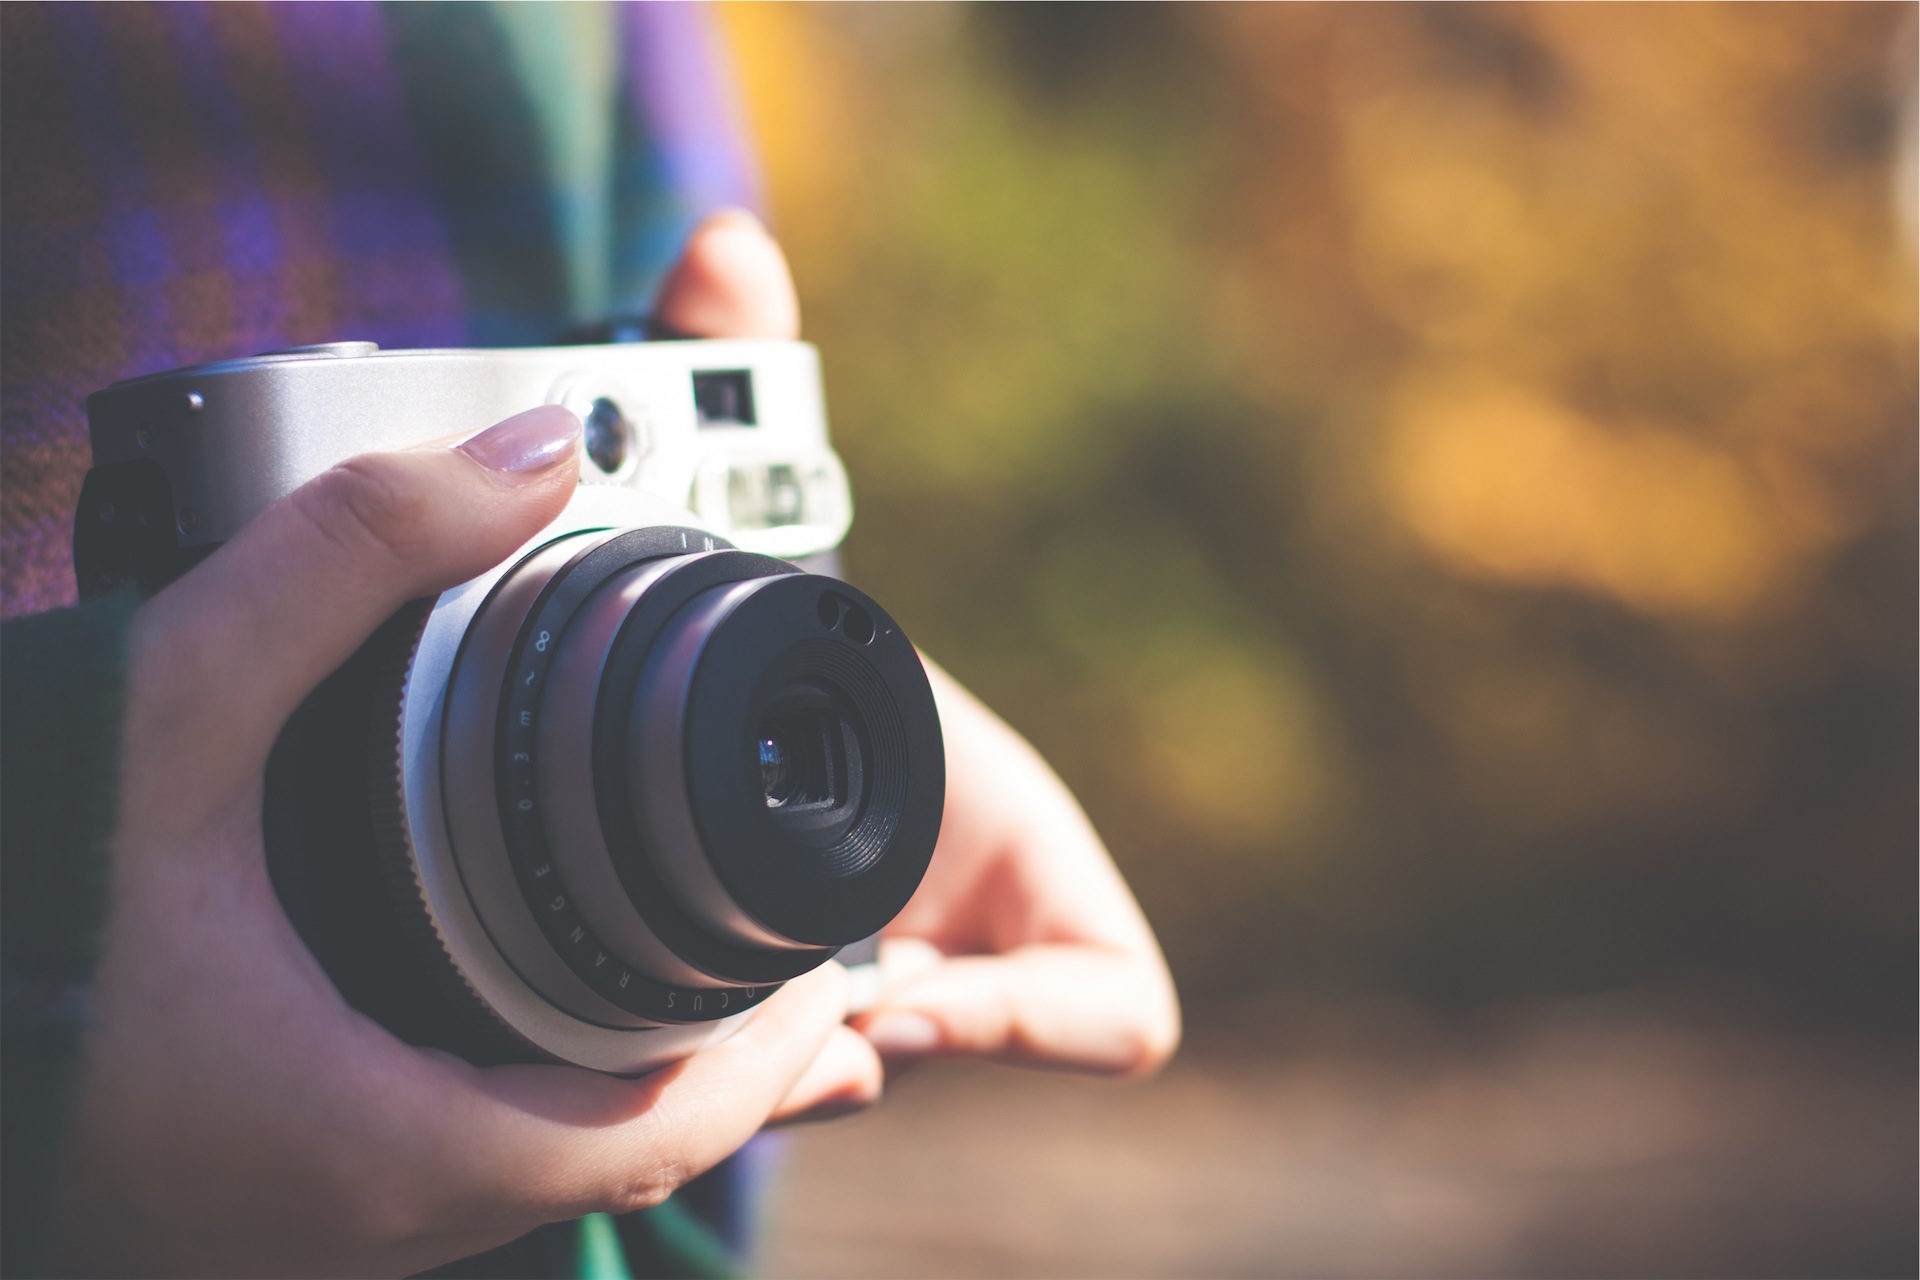 कैमरा, फोटो, महिला, हाथ, उद्देश्य - HD वॉलपेपर - प्रोफेसर-falken.com